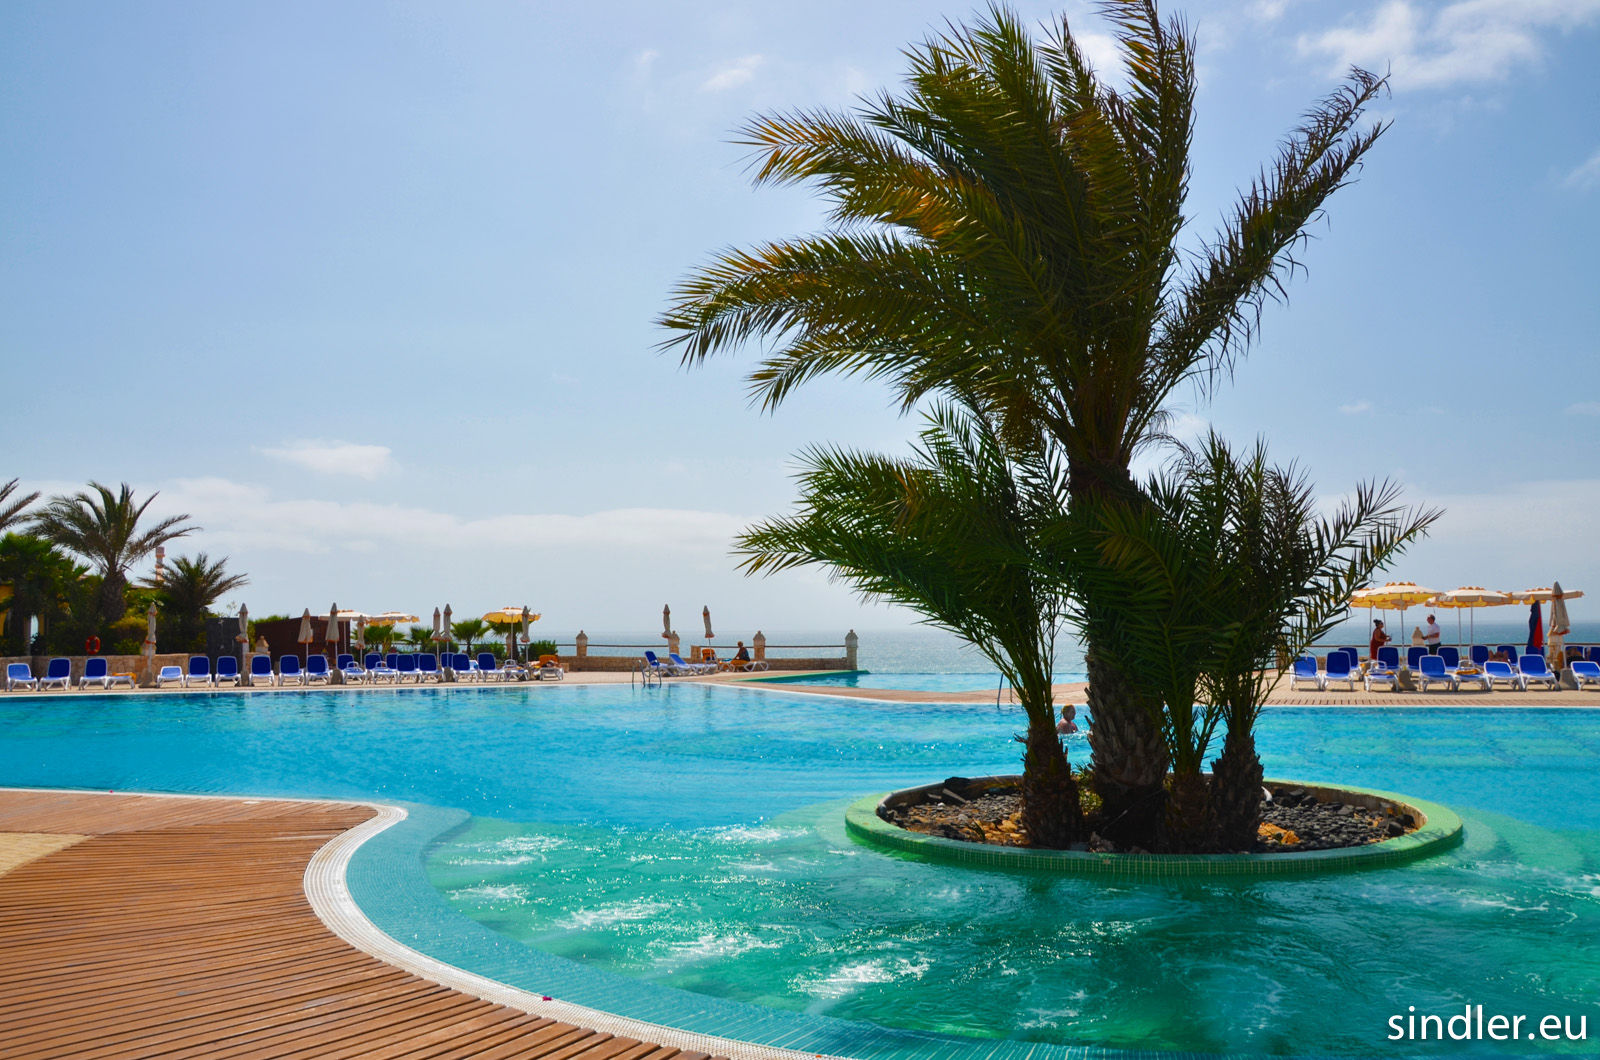 Hotel Iberostar Club Boa Vista bazén s palmami